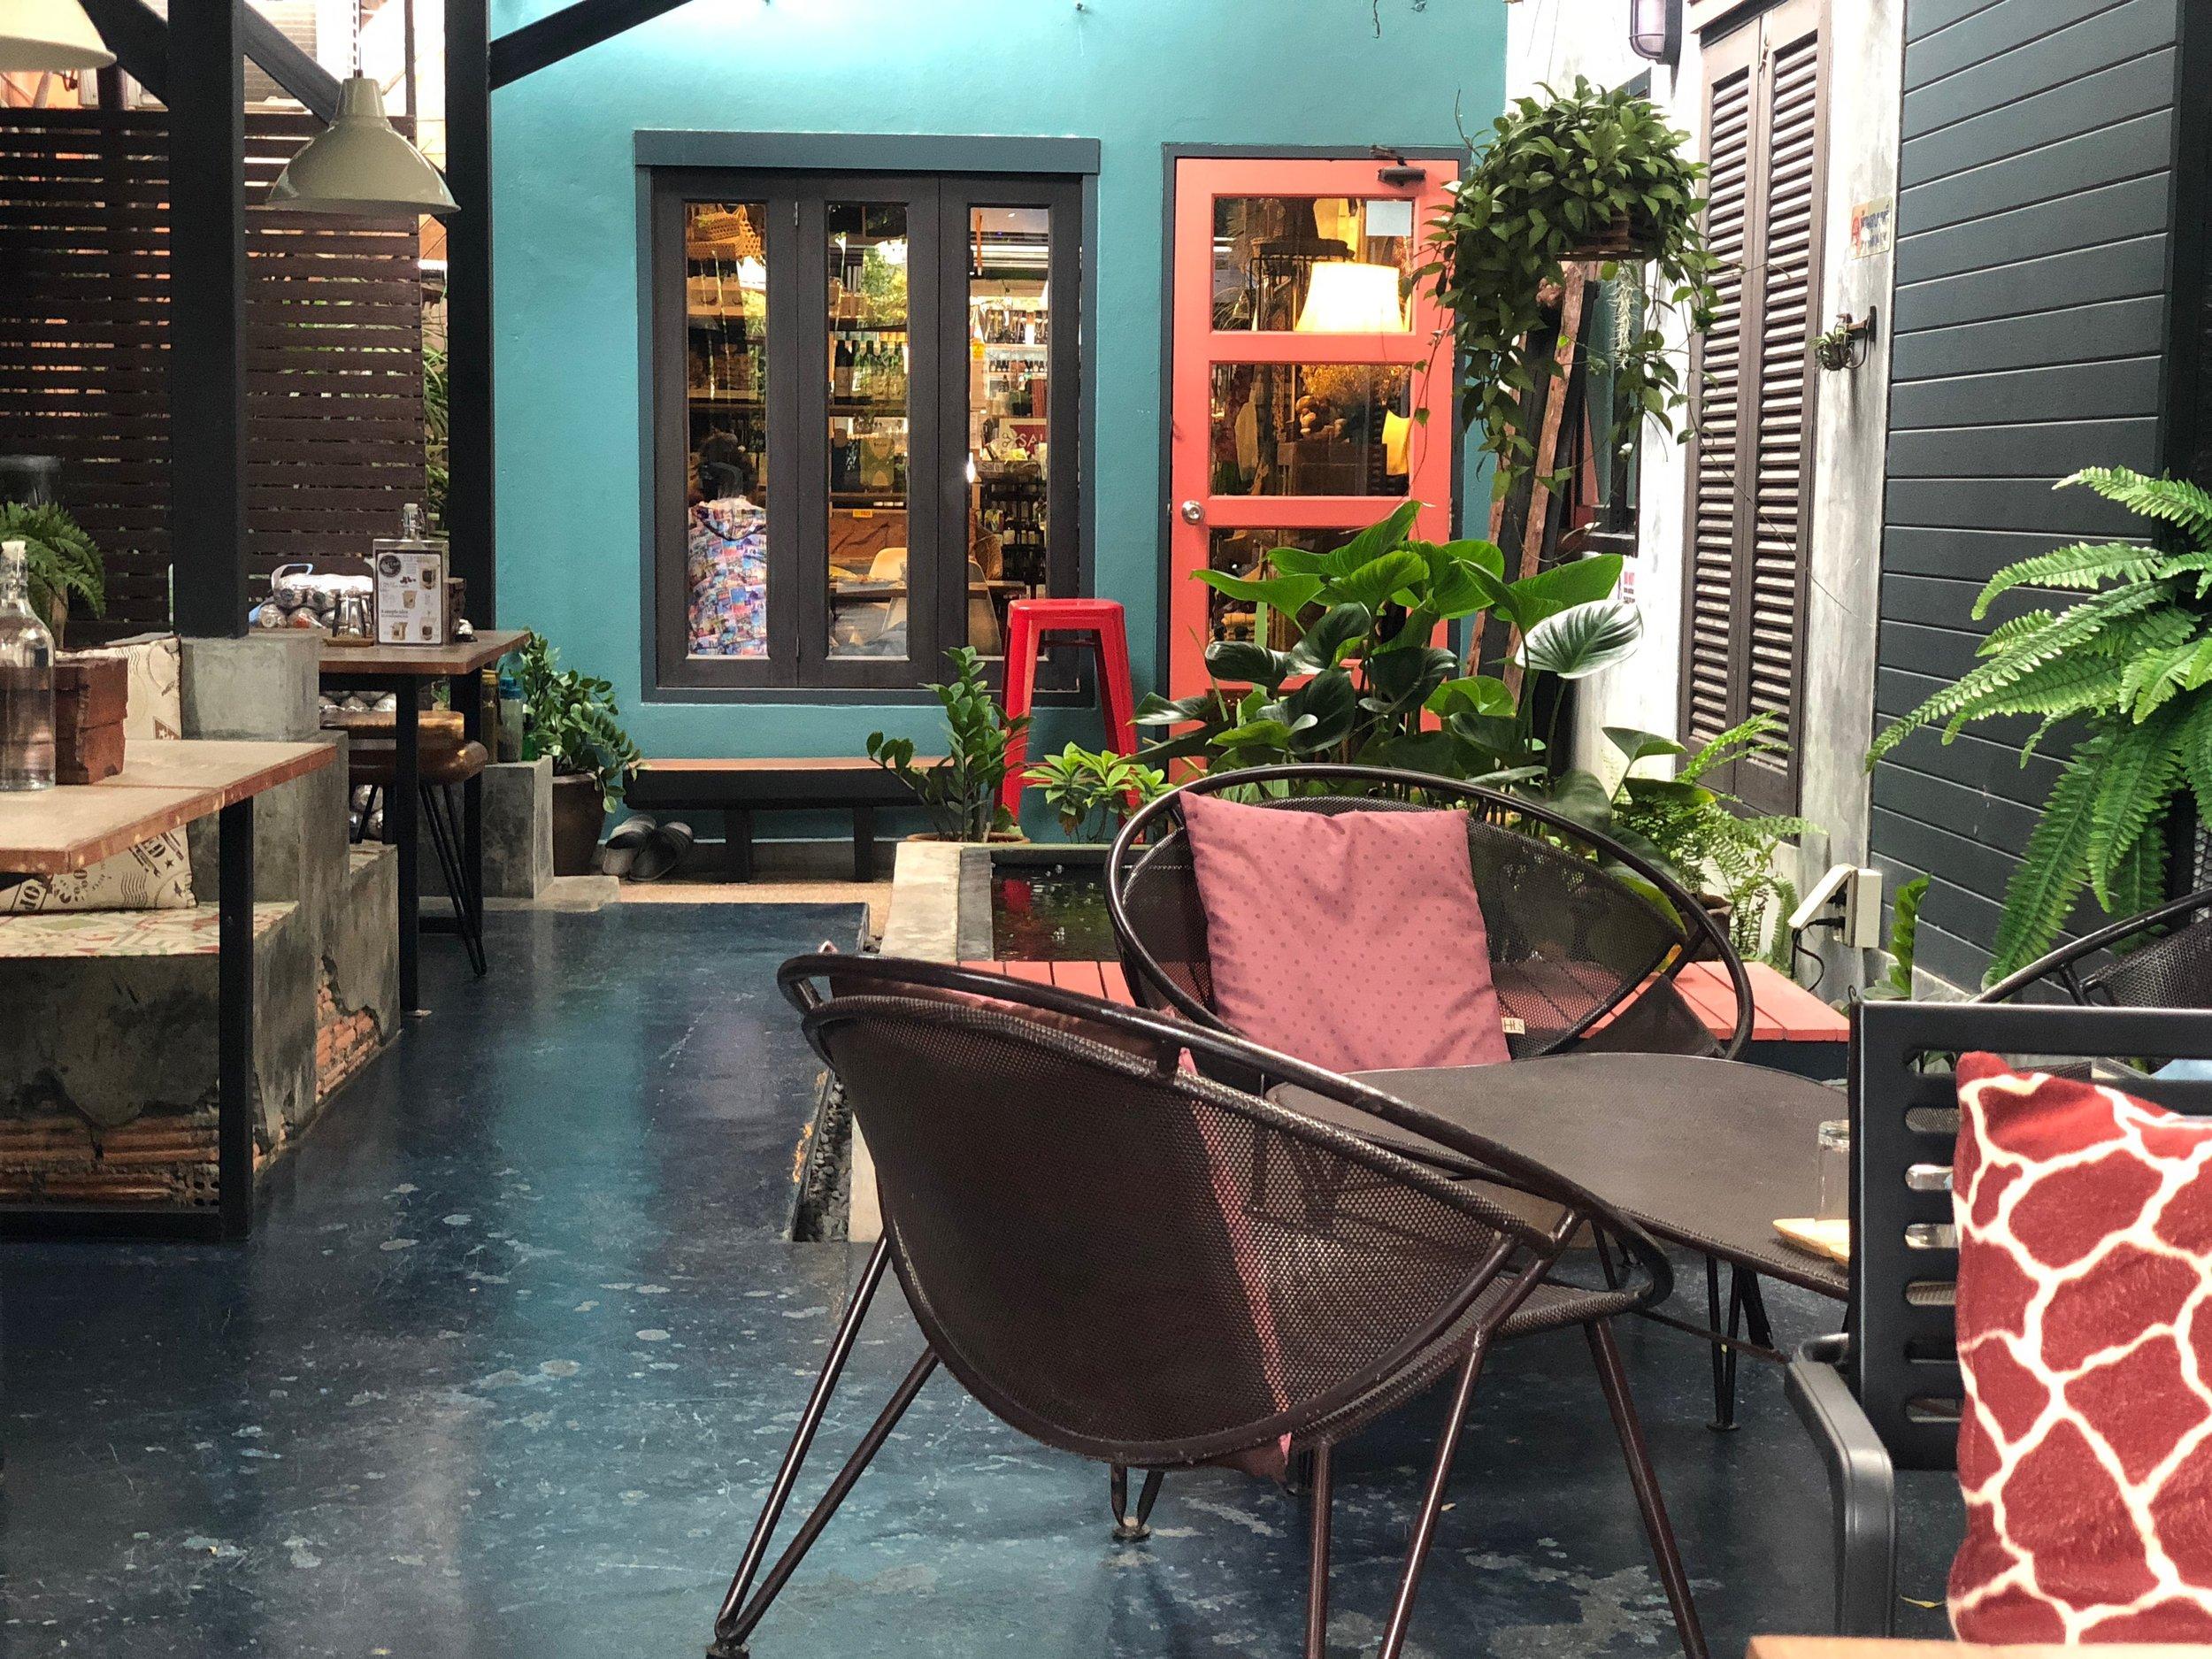 samui_health_shop_back_patio.jpg